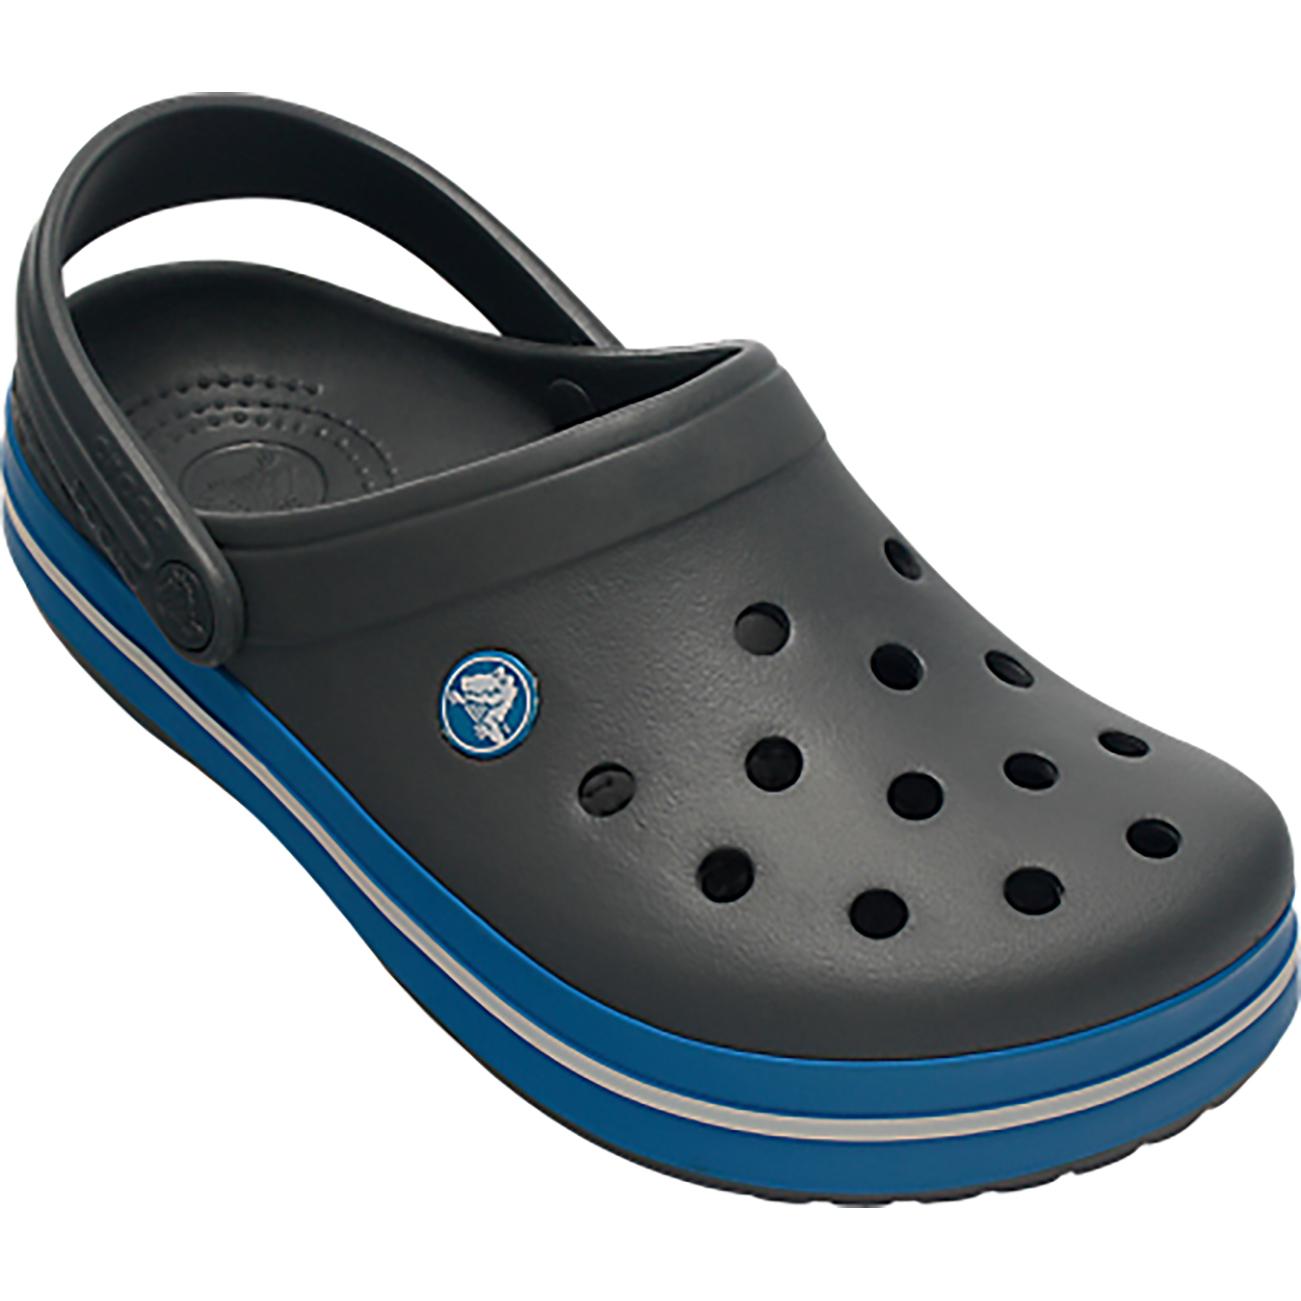 Unisex-Adults-Crocs-Crocband-Clog-Comfort-Lightweight-Water-Pool-Shoes-UK-3-16 thumbnail 6